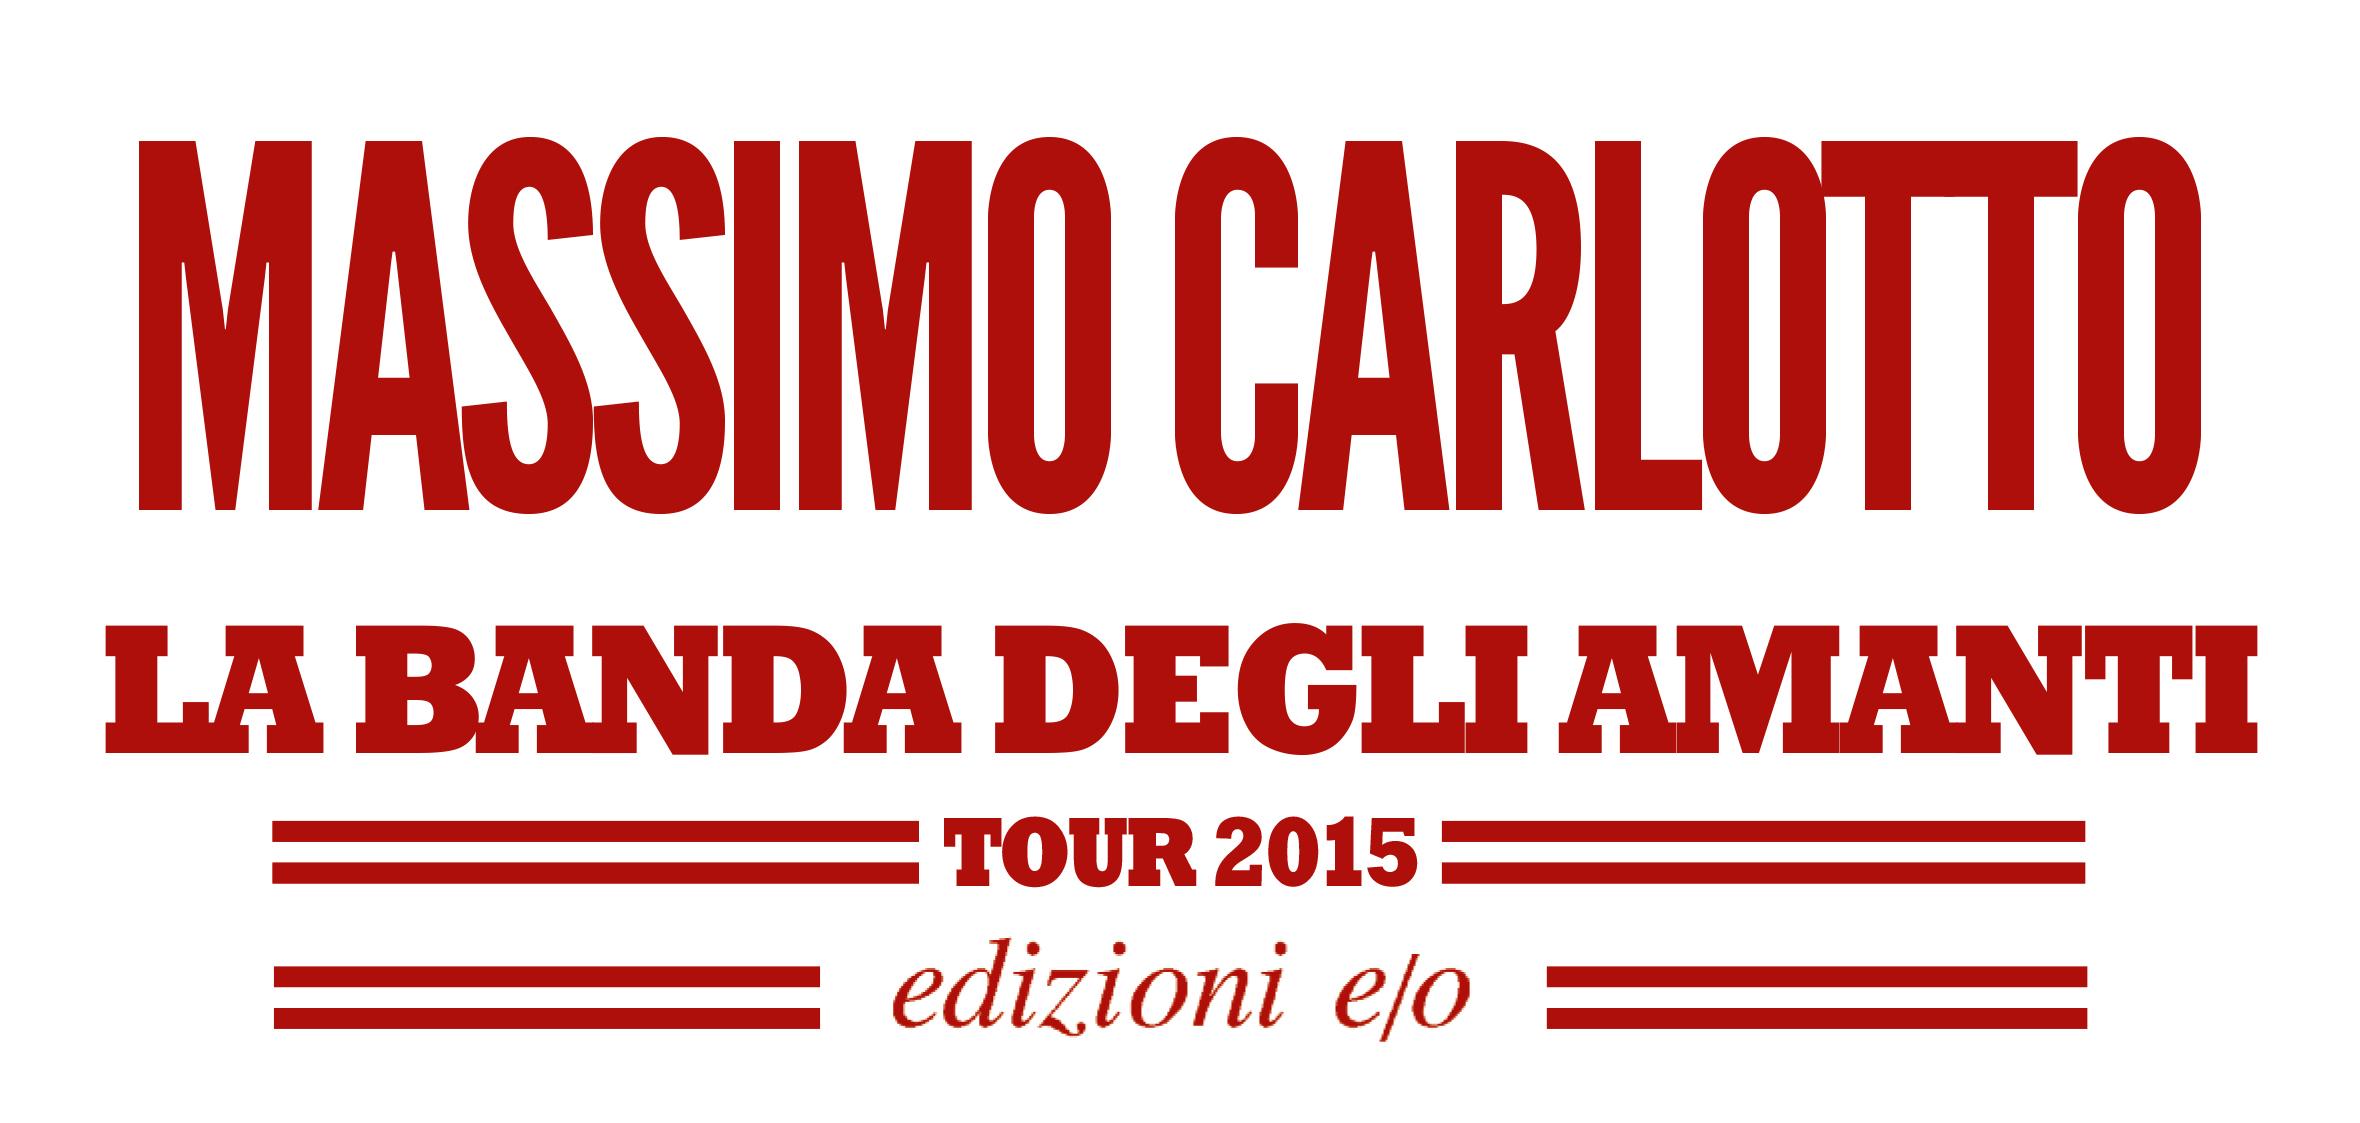 Tour Carlotto Banda degli amanti